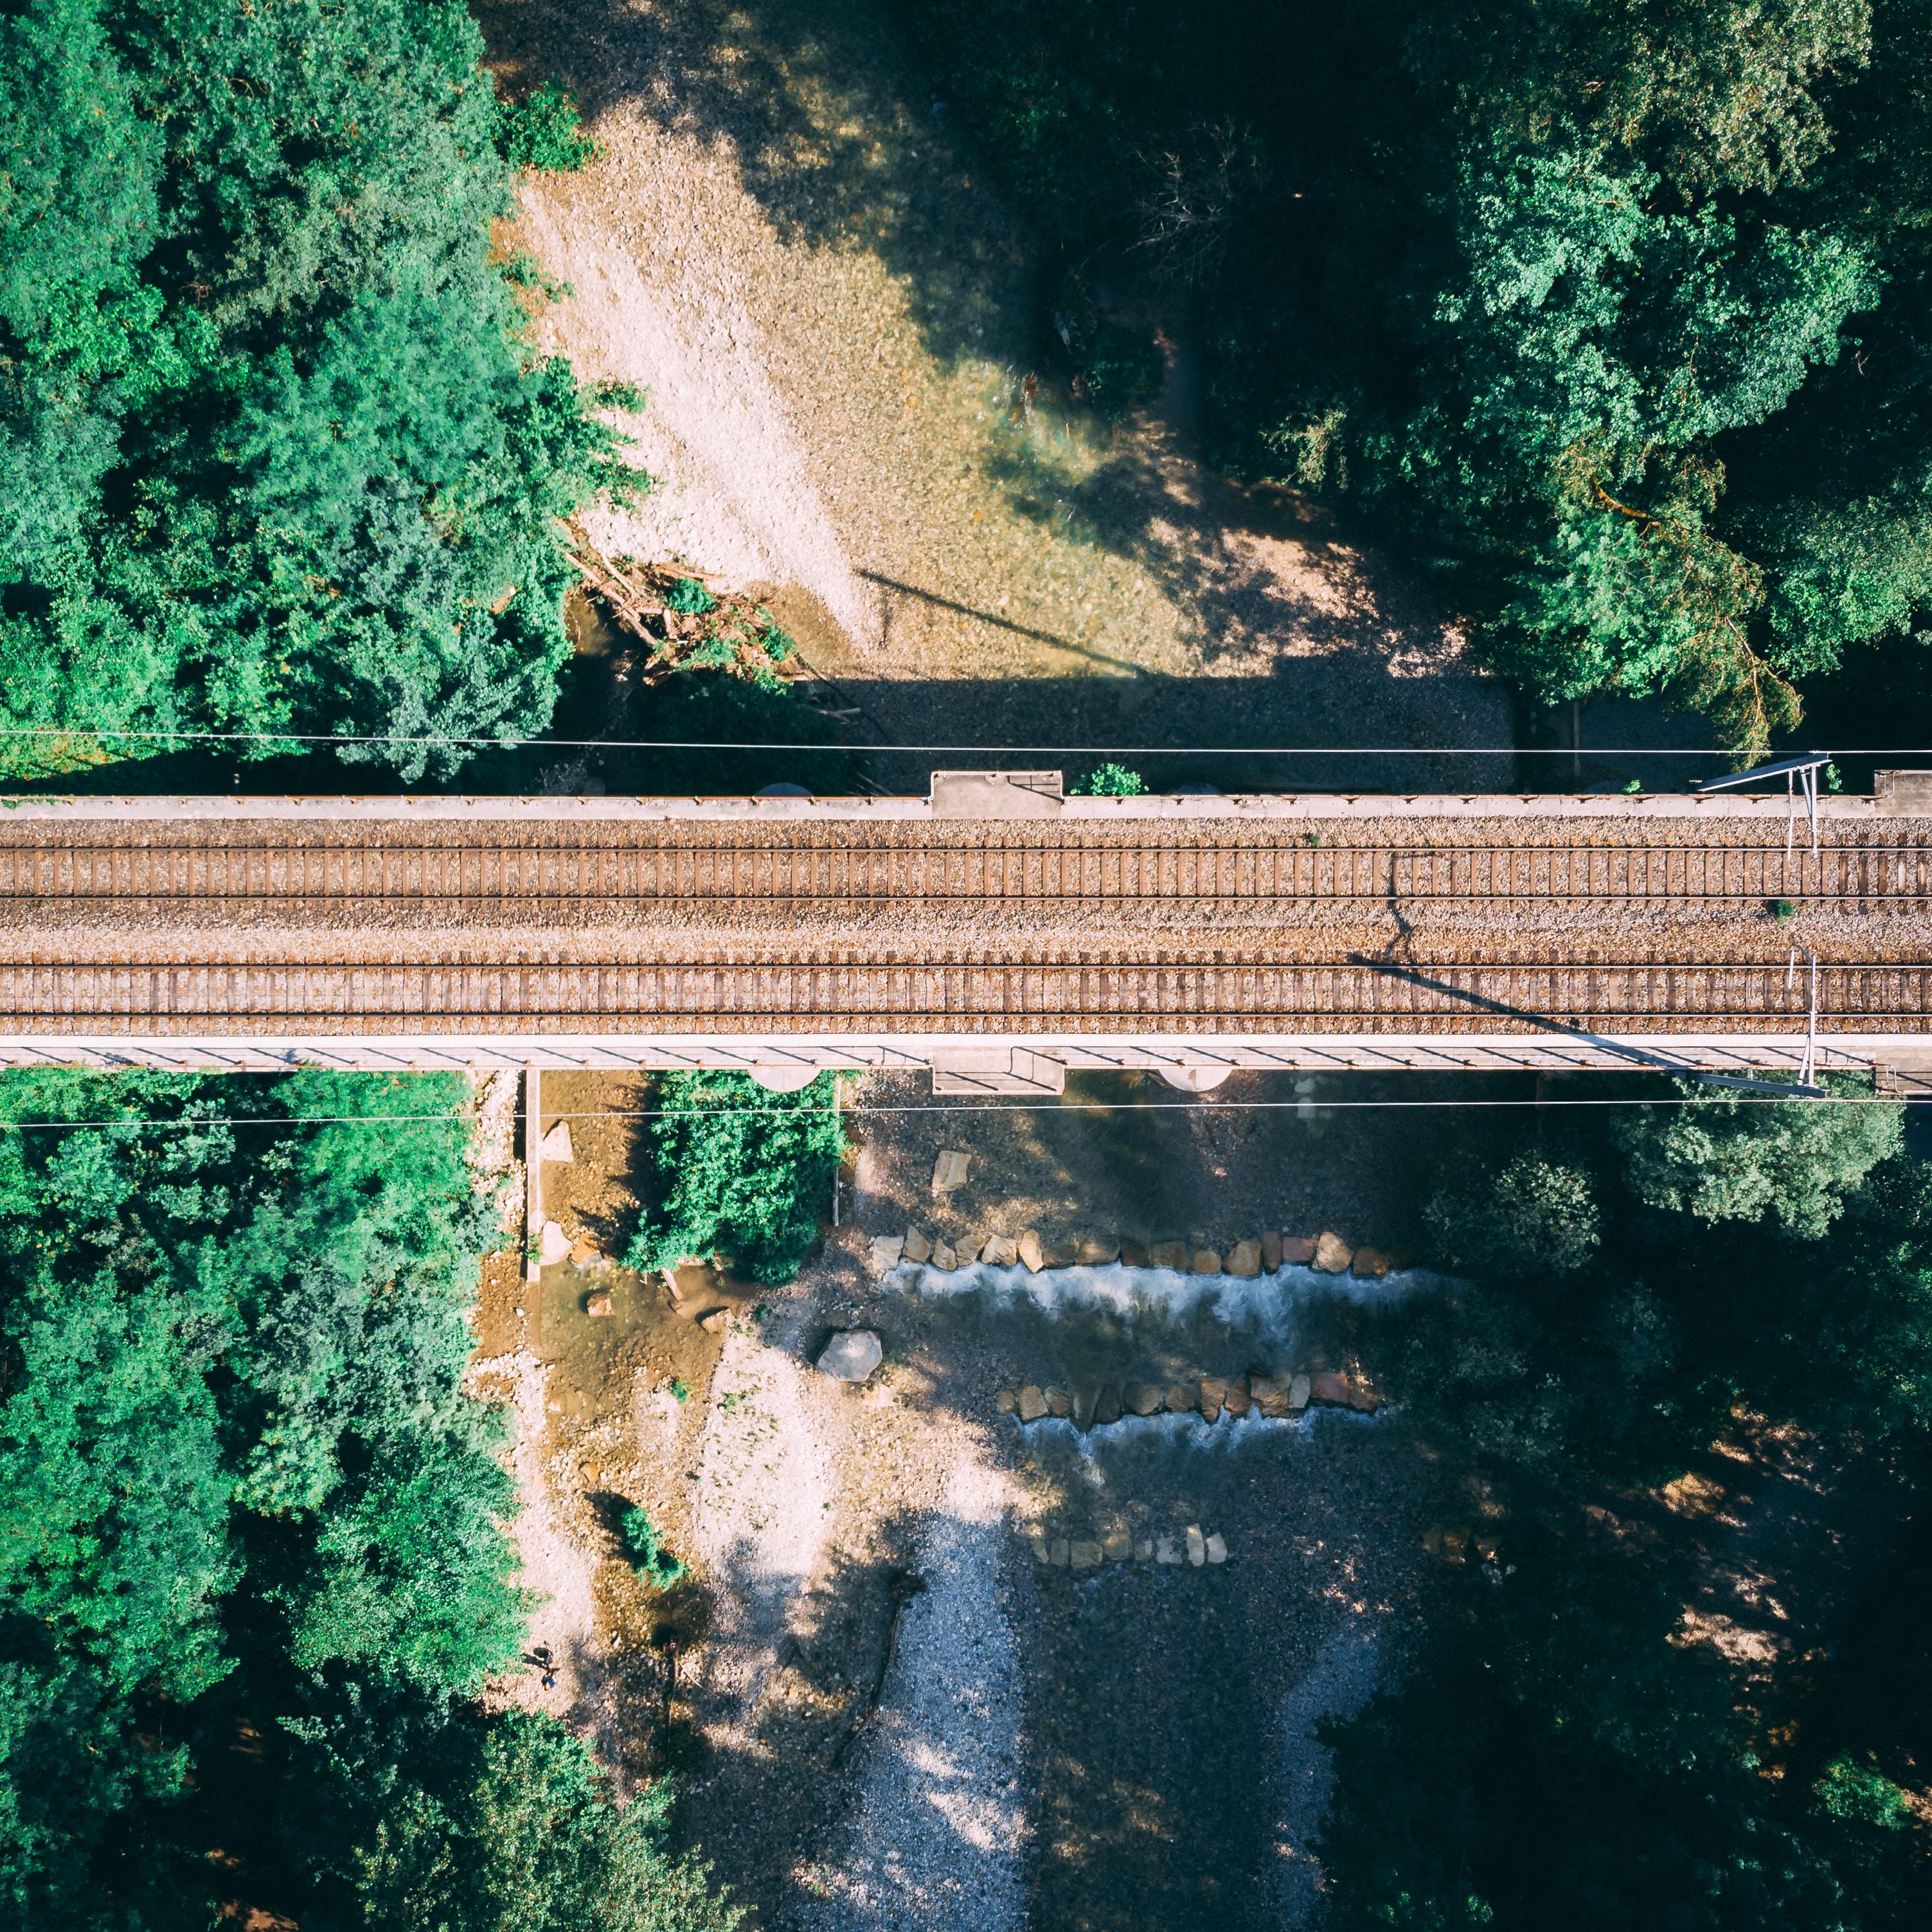 bird's-eye view photo of brown bridge